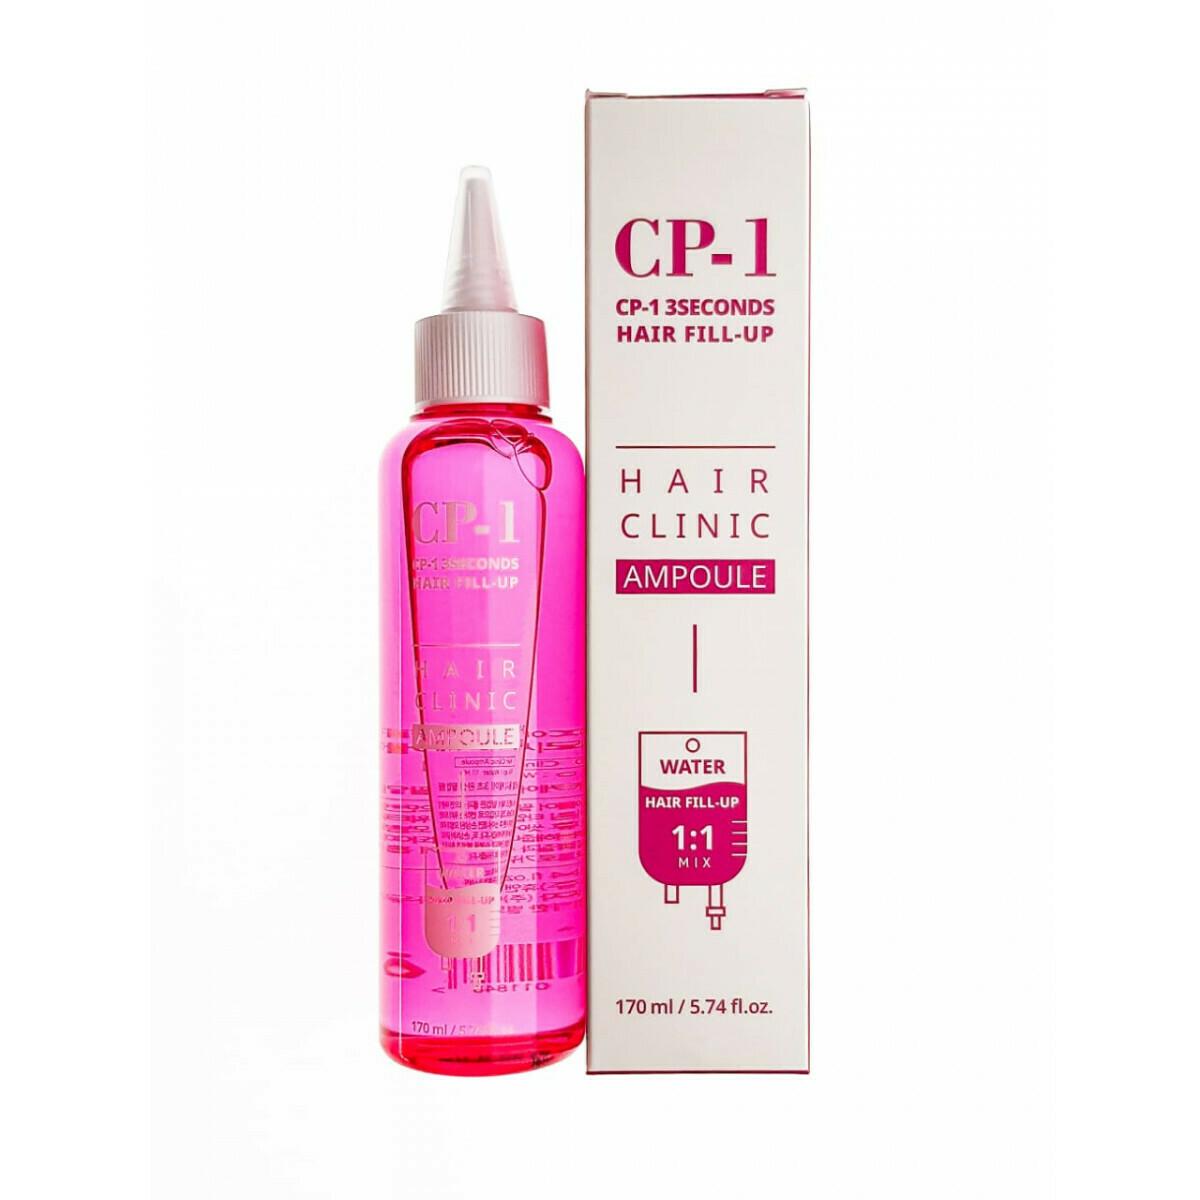 Esthetic House Маска-филлер для волос Seconds Hair Ringer CP-1